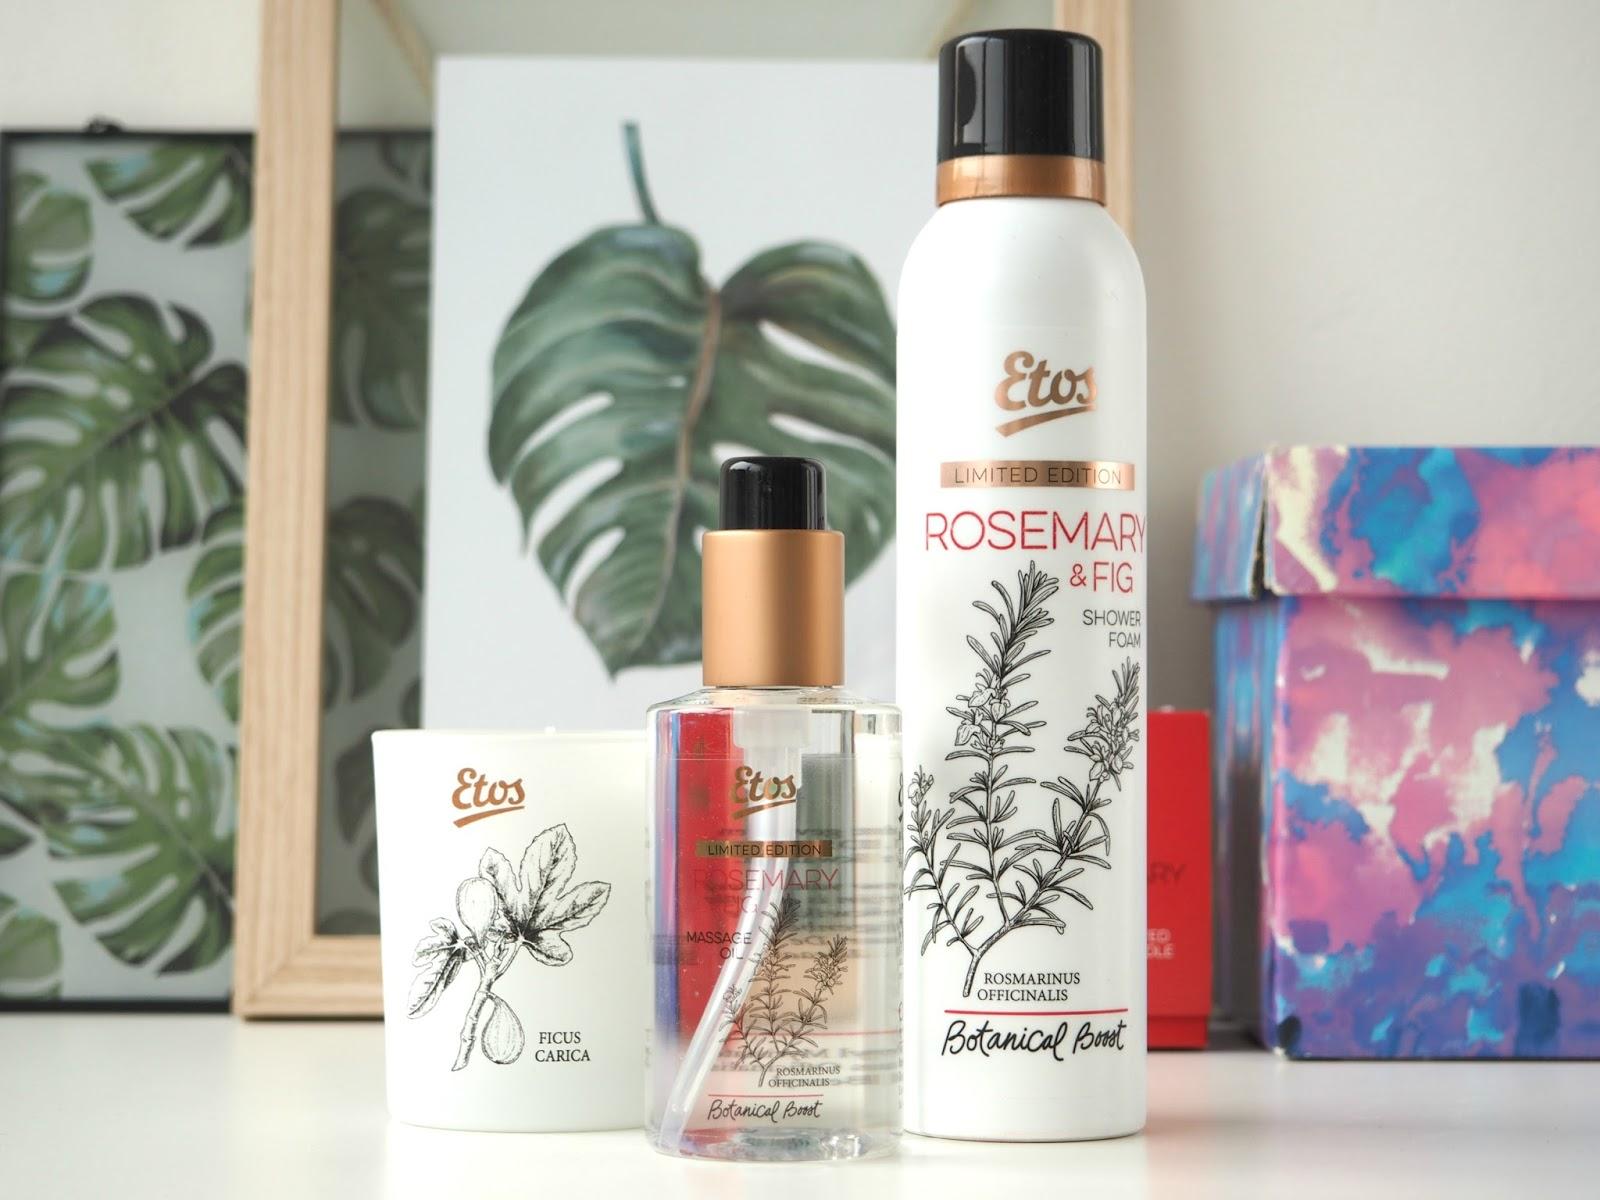 Body Etos Botanical Boost Rosemary Fig Producten Mira Tells